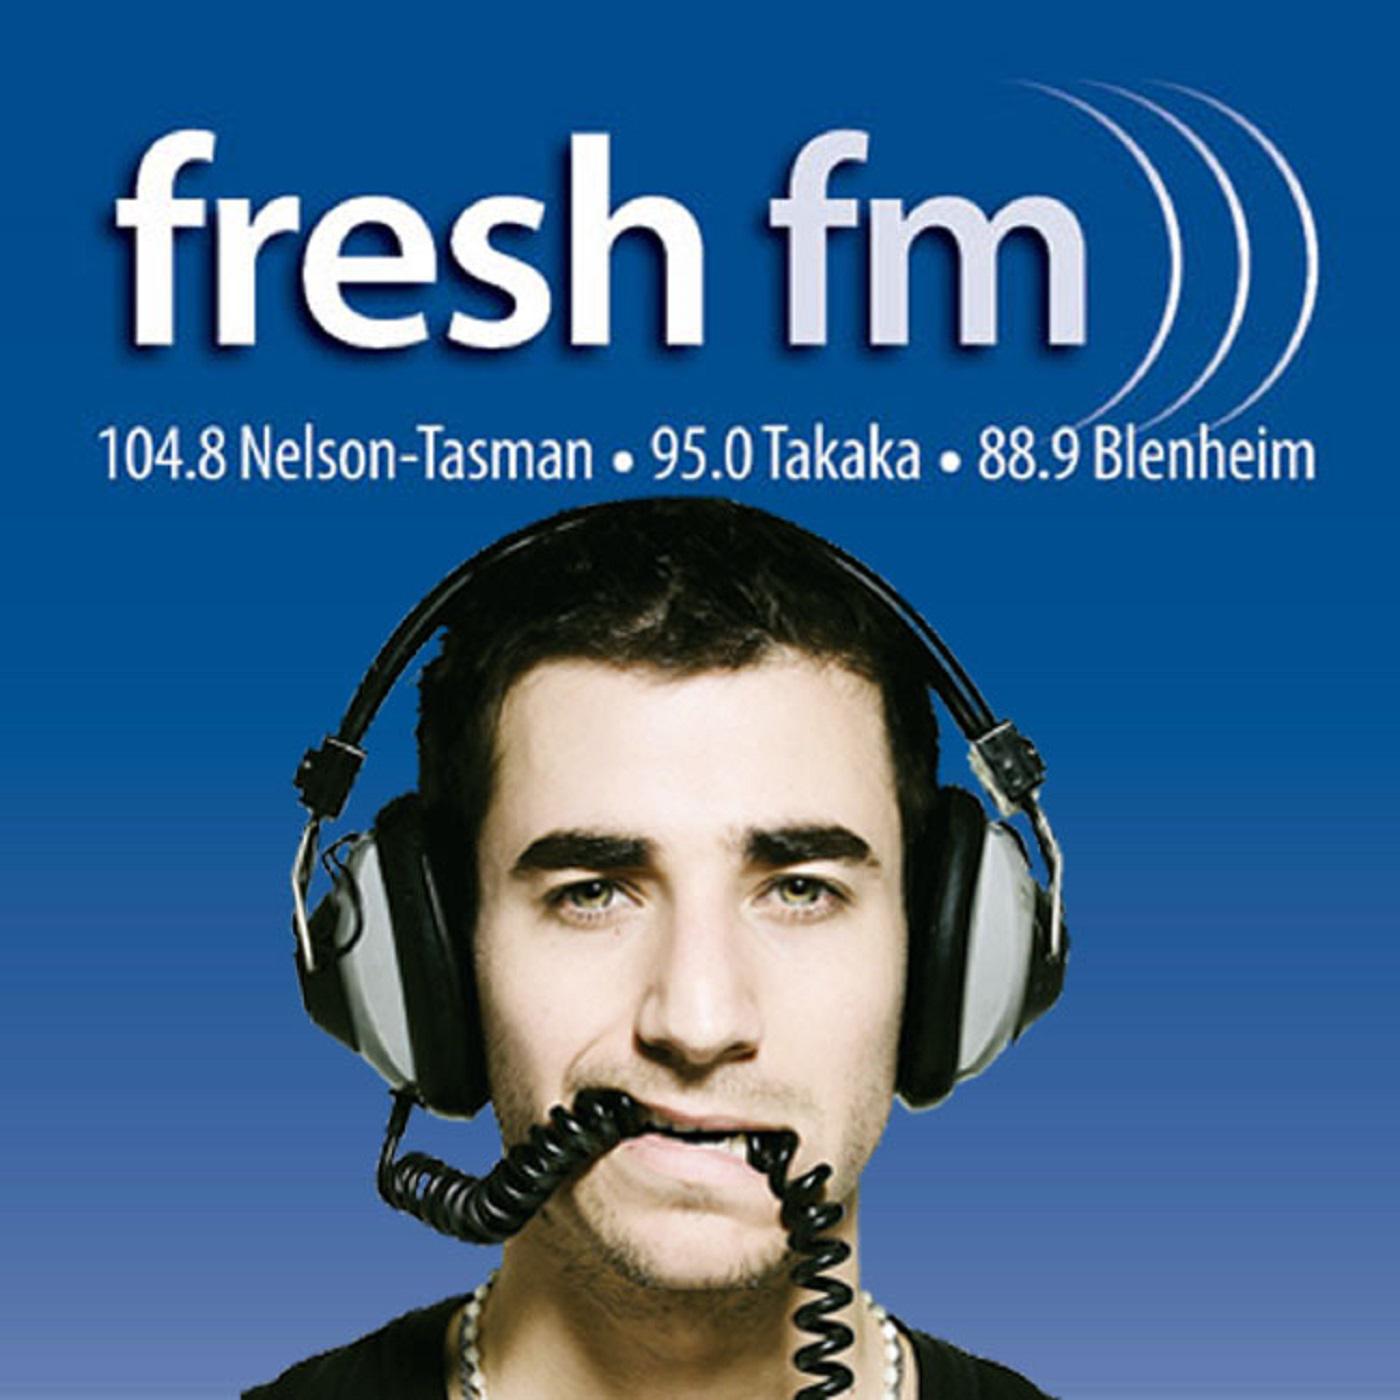 https://cdn.accessradio.org/StationFolder/freshfm/Images/Fresh-FM-Art1400115.png